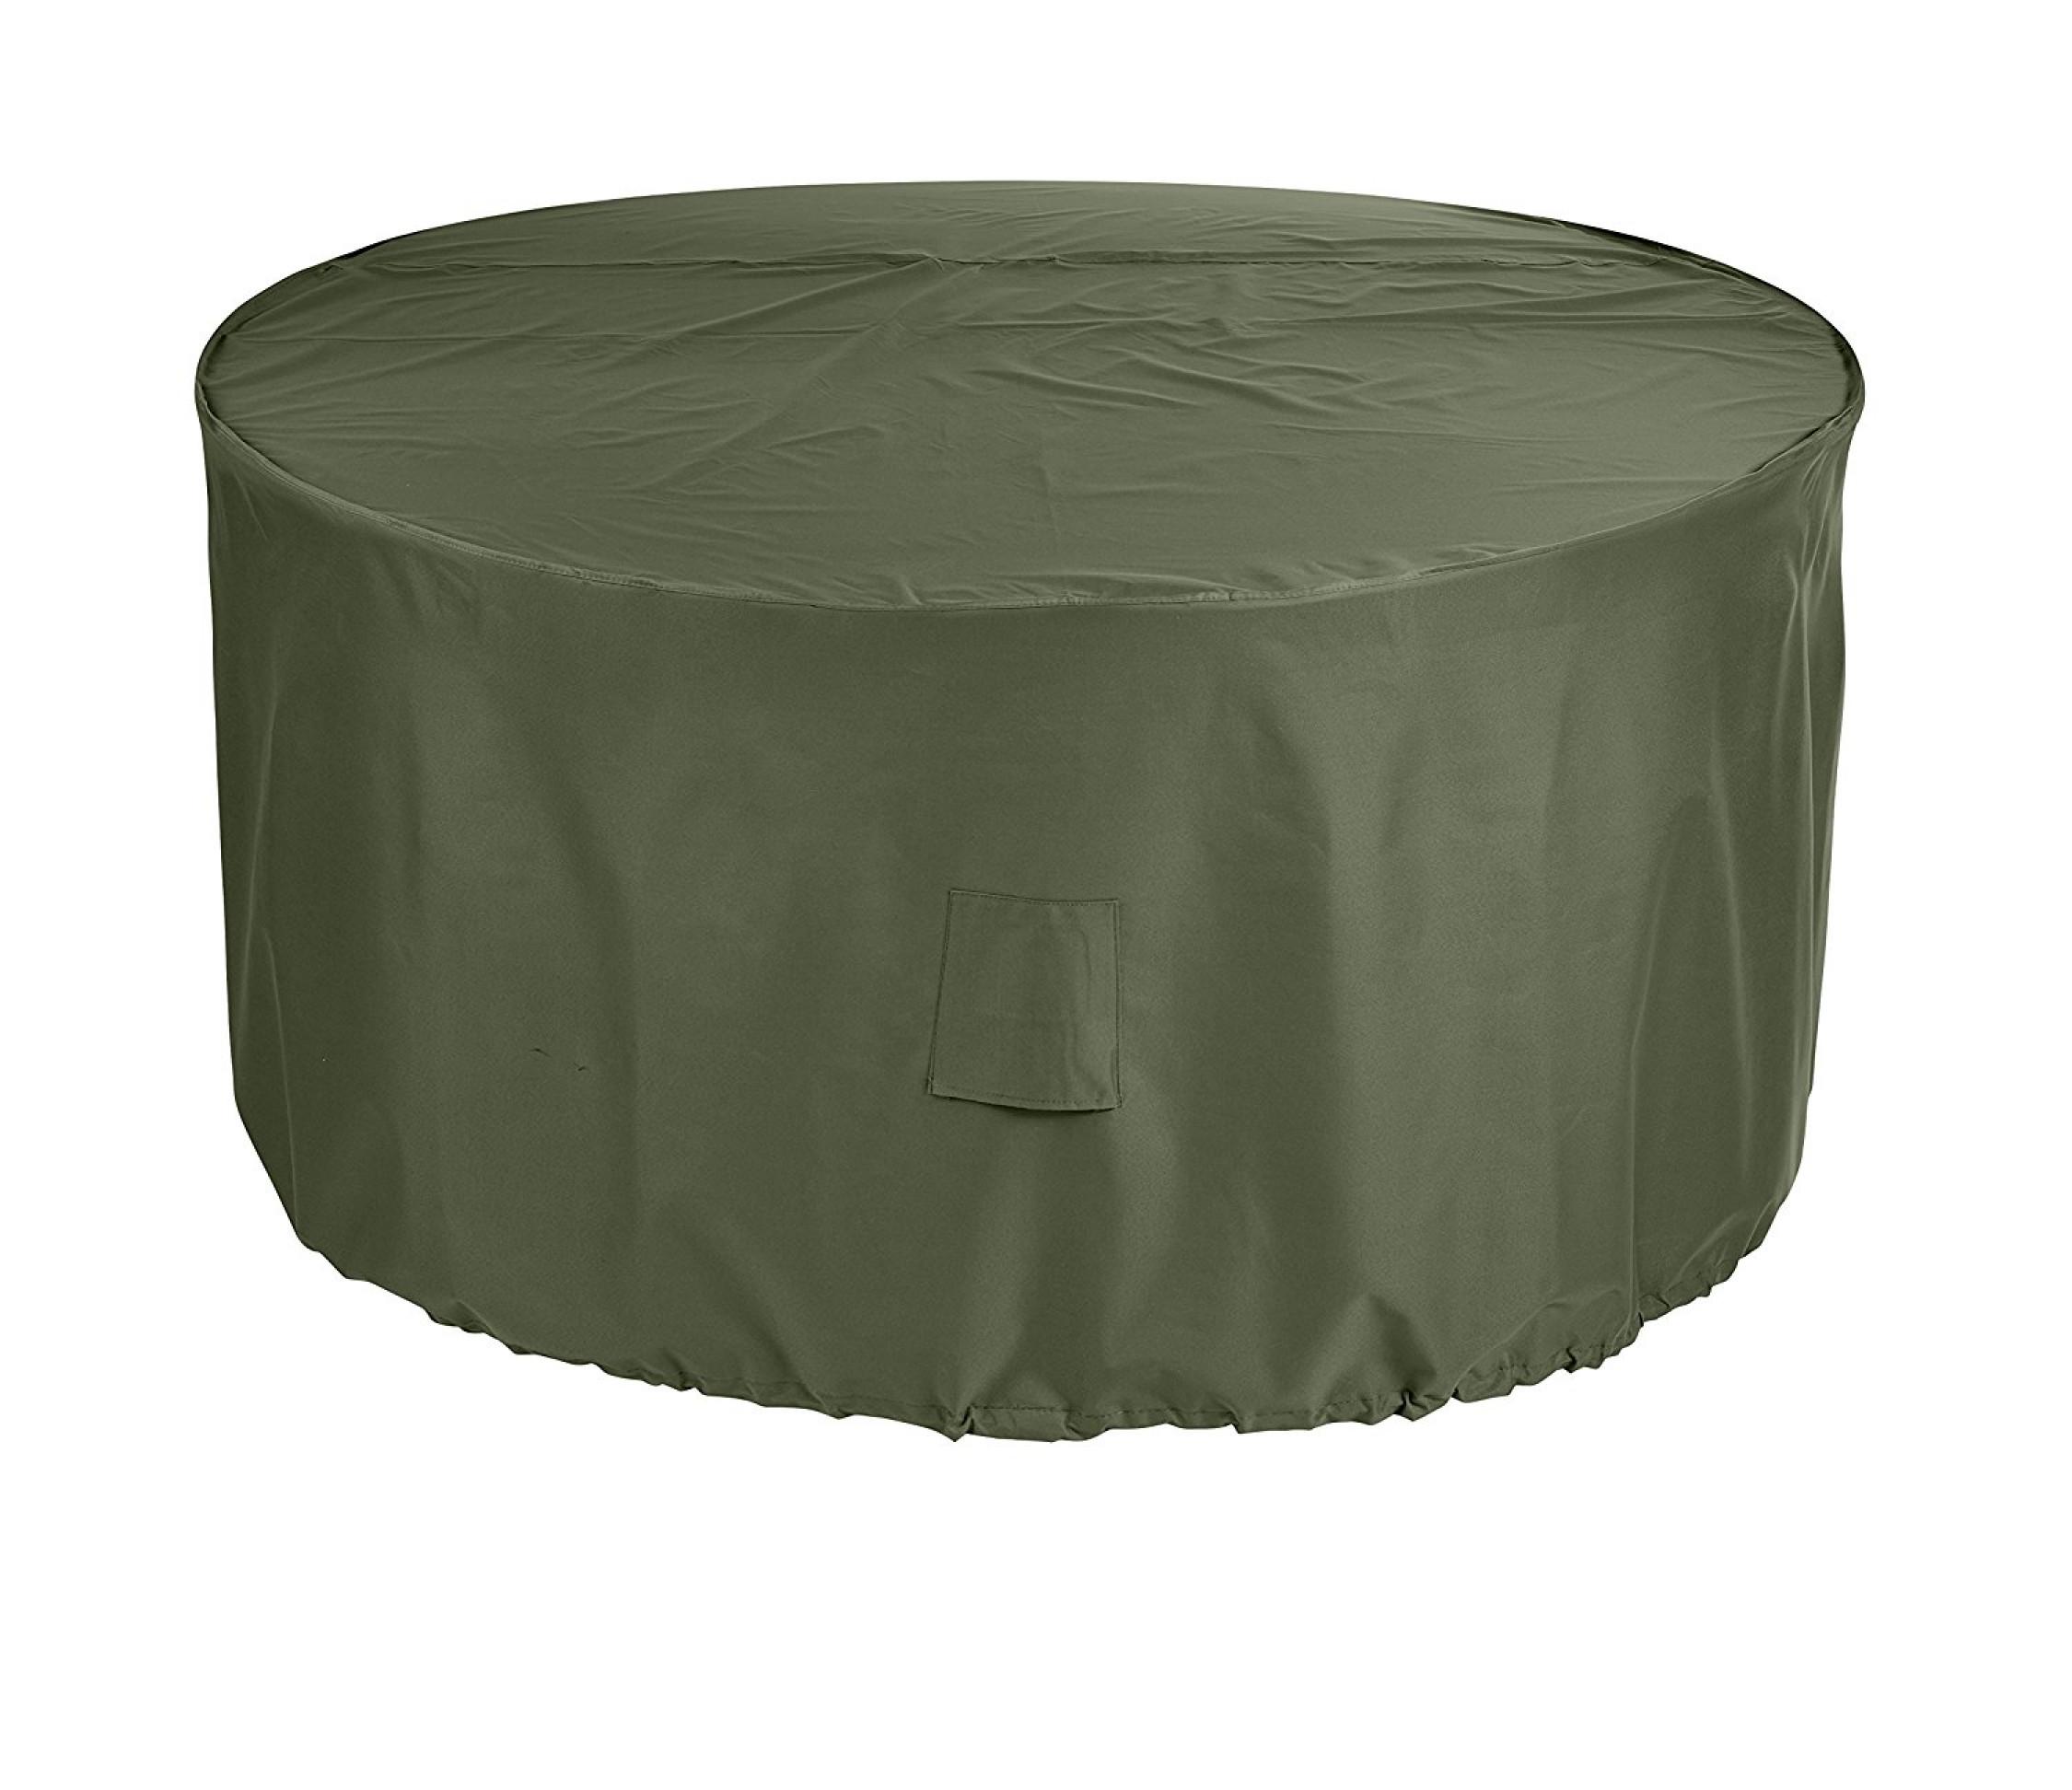 Gardman Green Premium Medium M Round Patio Set Furniture